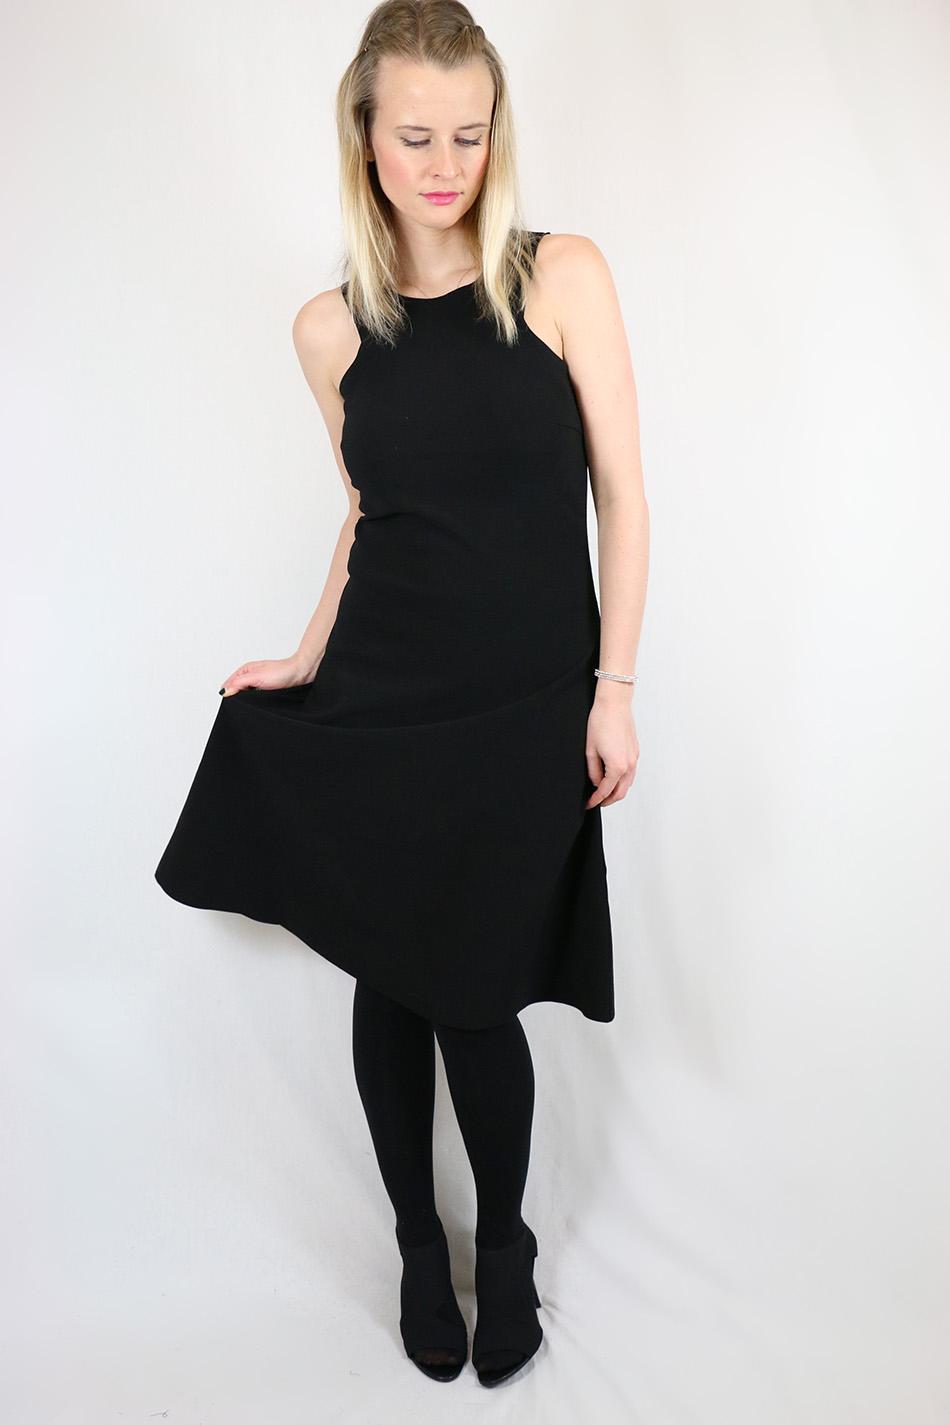 Fringe and Doll Black A-line dress IMG_1708